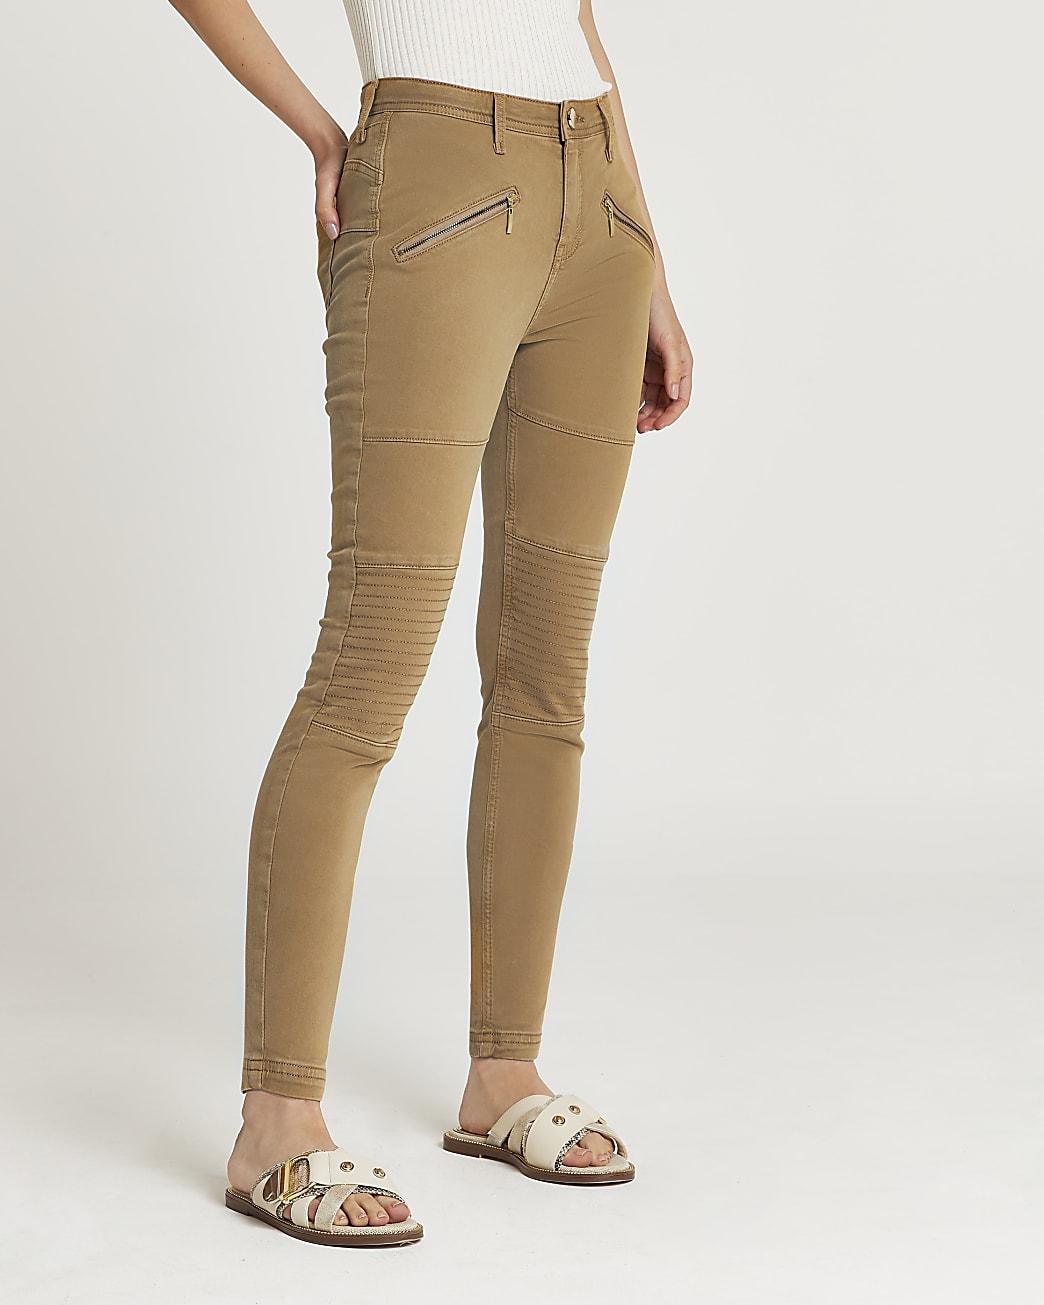 Brown mid rise bum sculpt skinny jeans